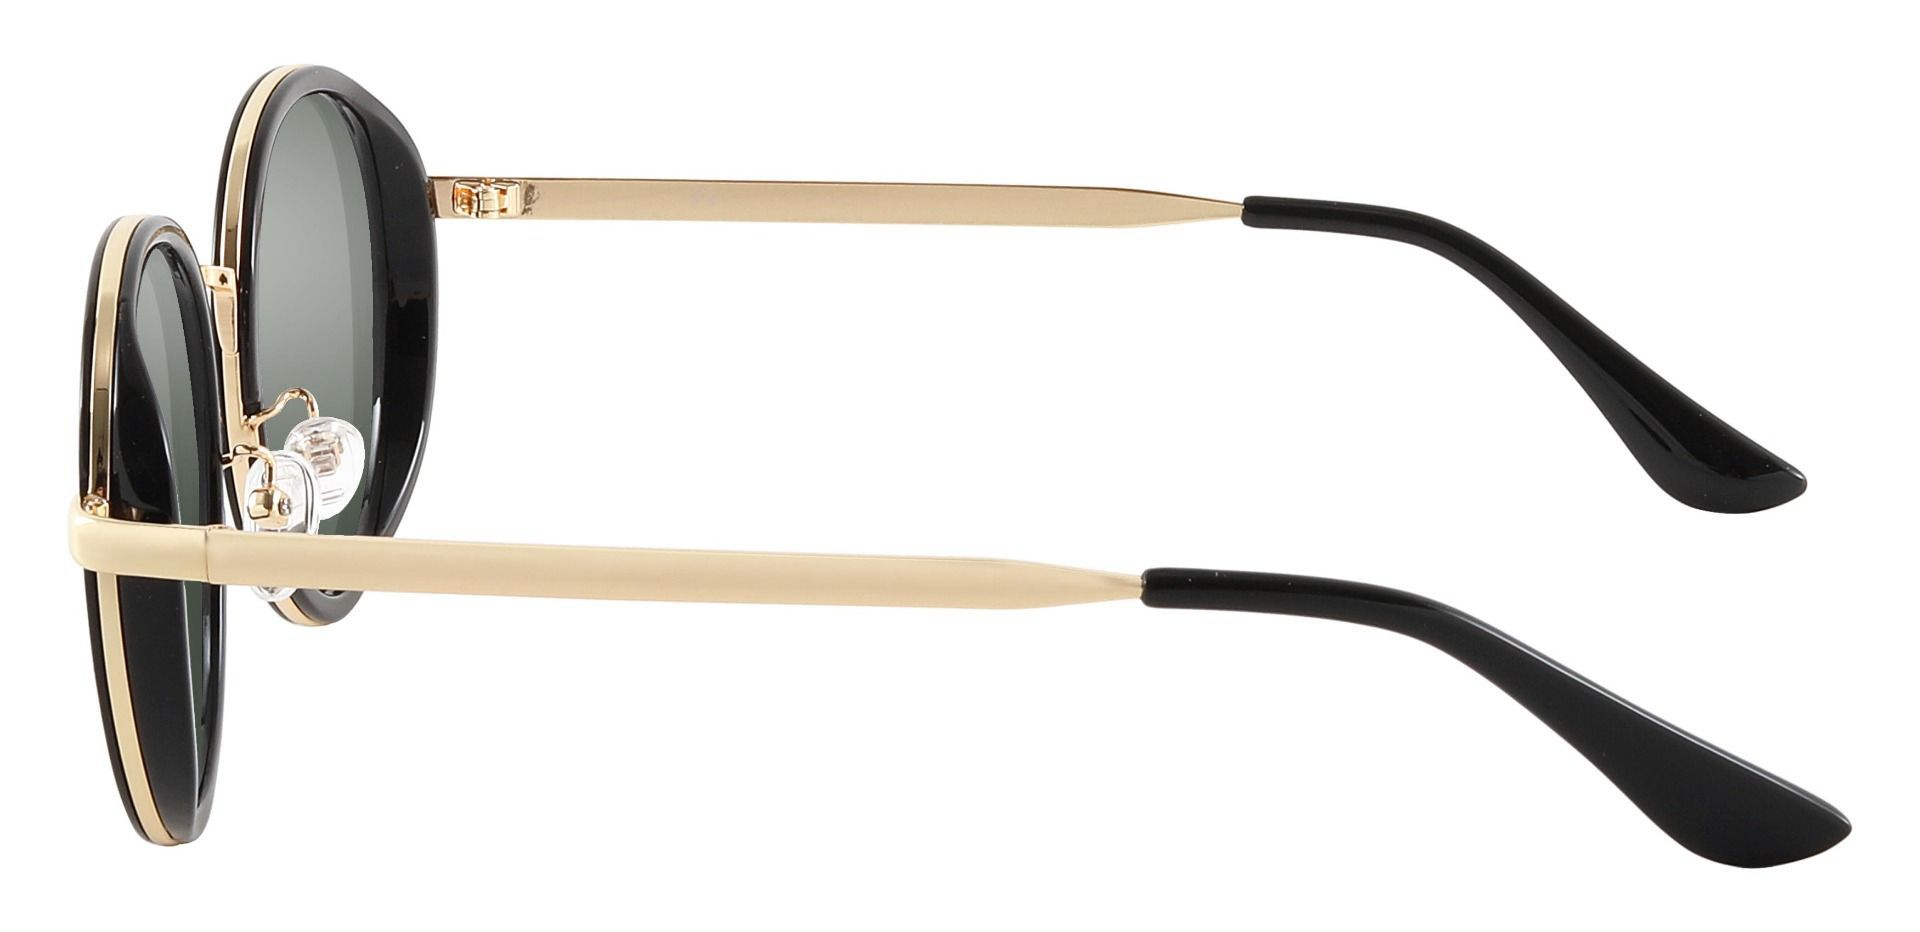 Bosco Round Prescription Sunglasses - Black Frame With Green Lenses